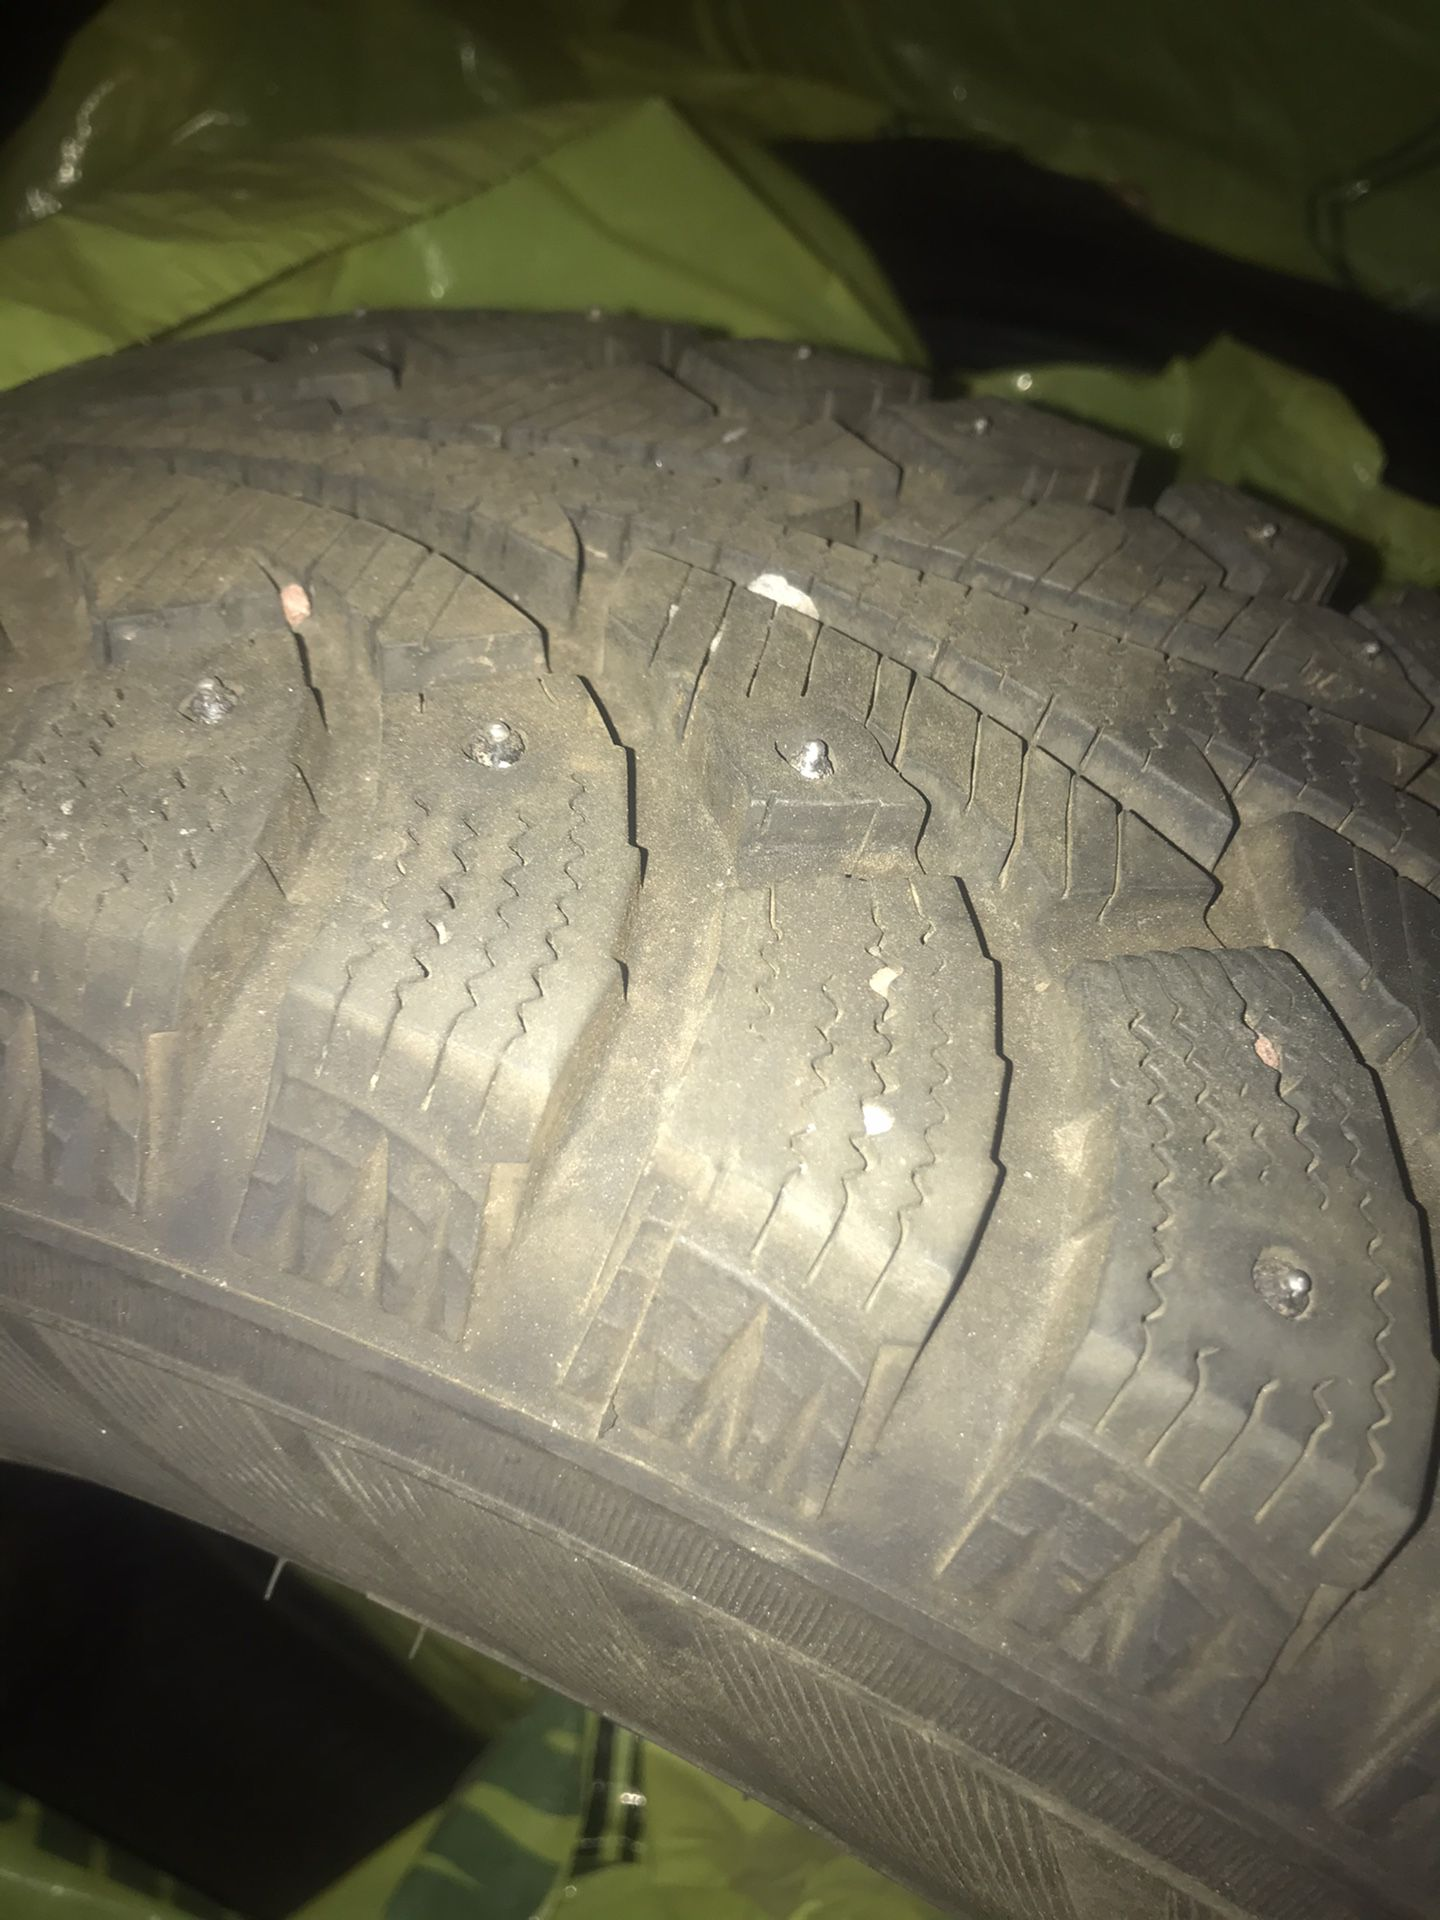 195/65r 15 winter pike snow stud tires